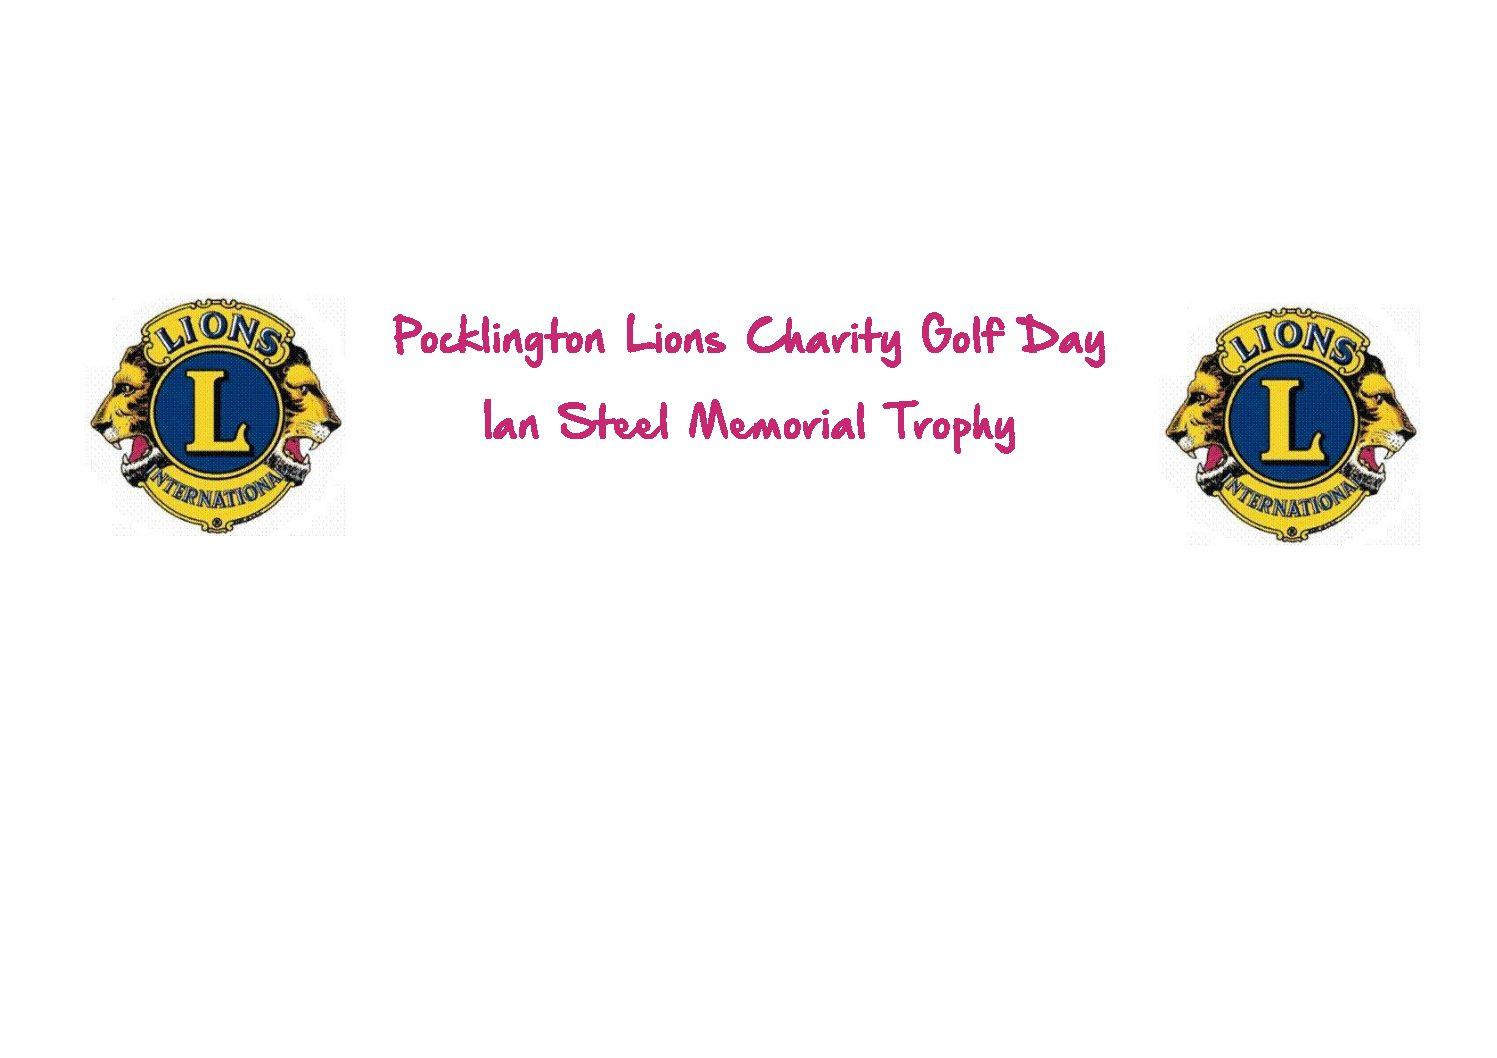 Pocklington Lions Charity Golf Day